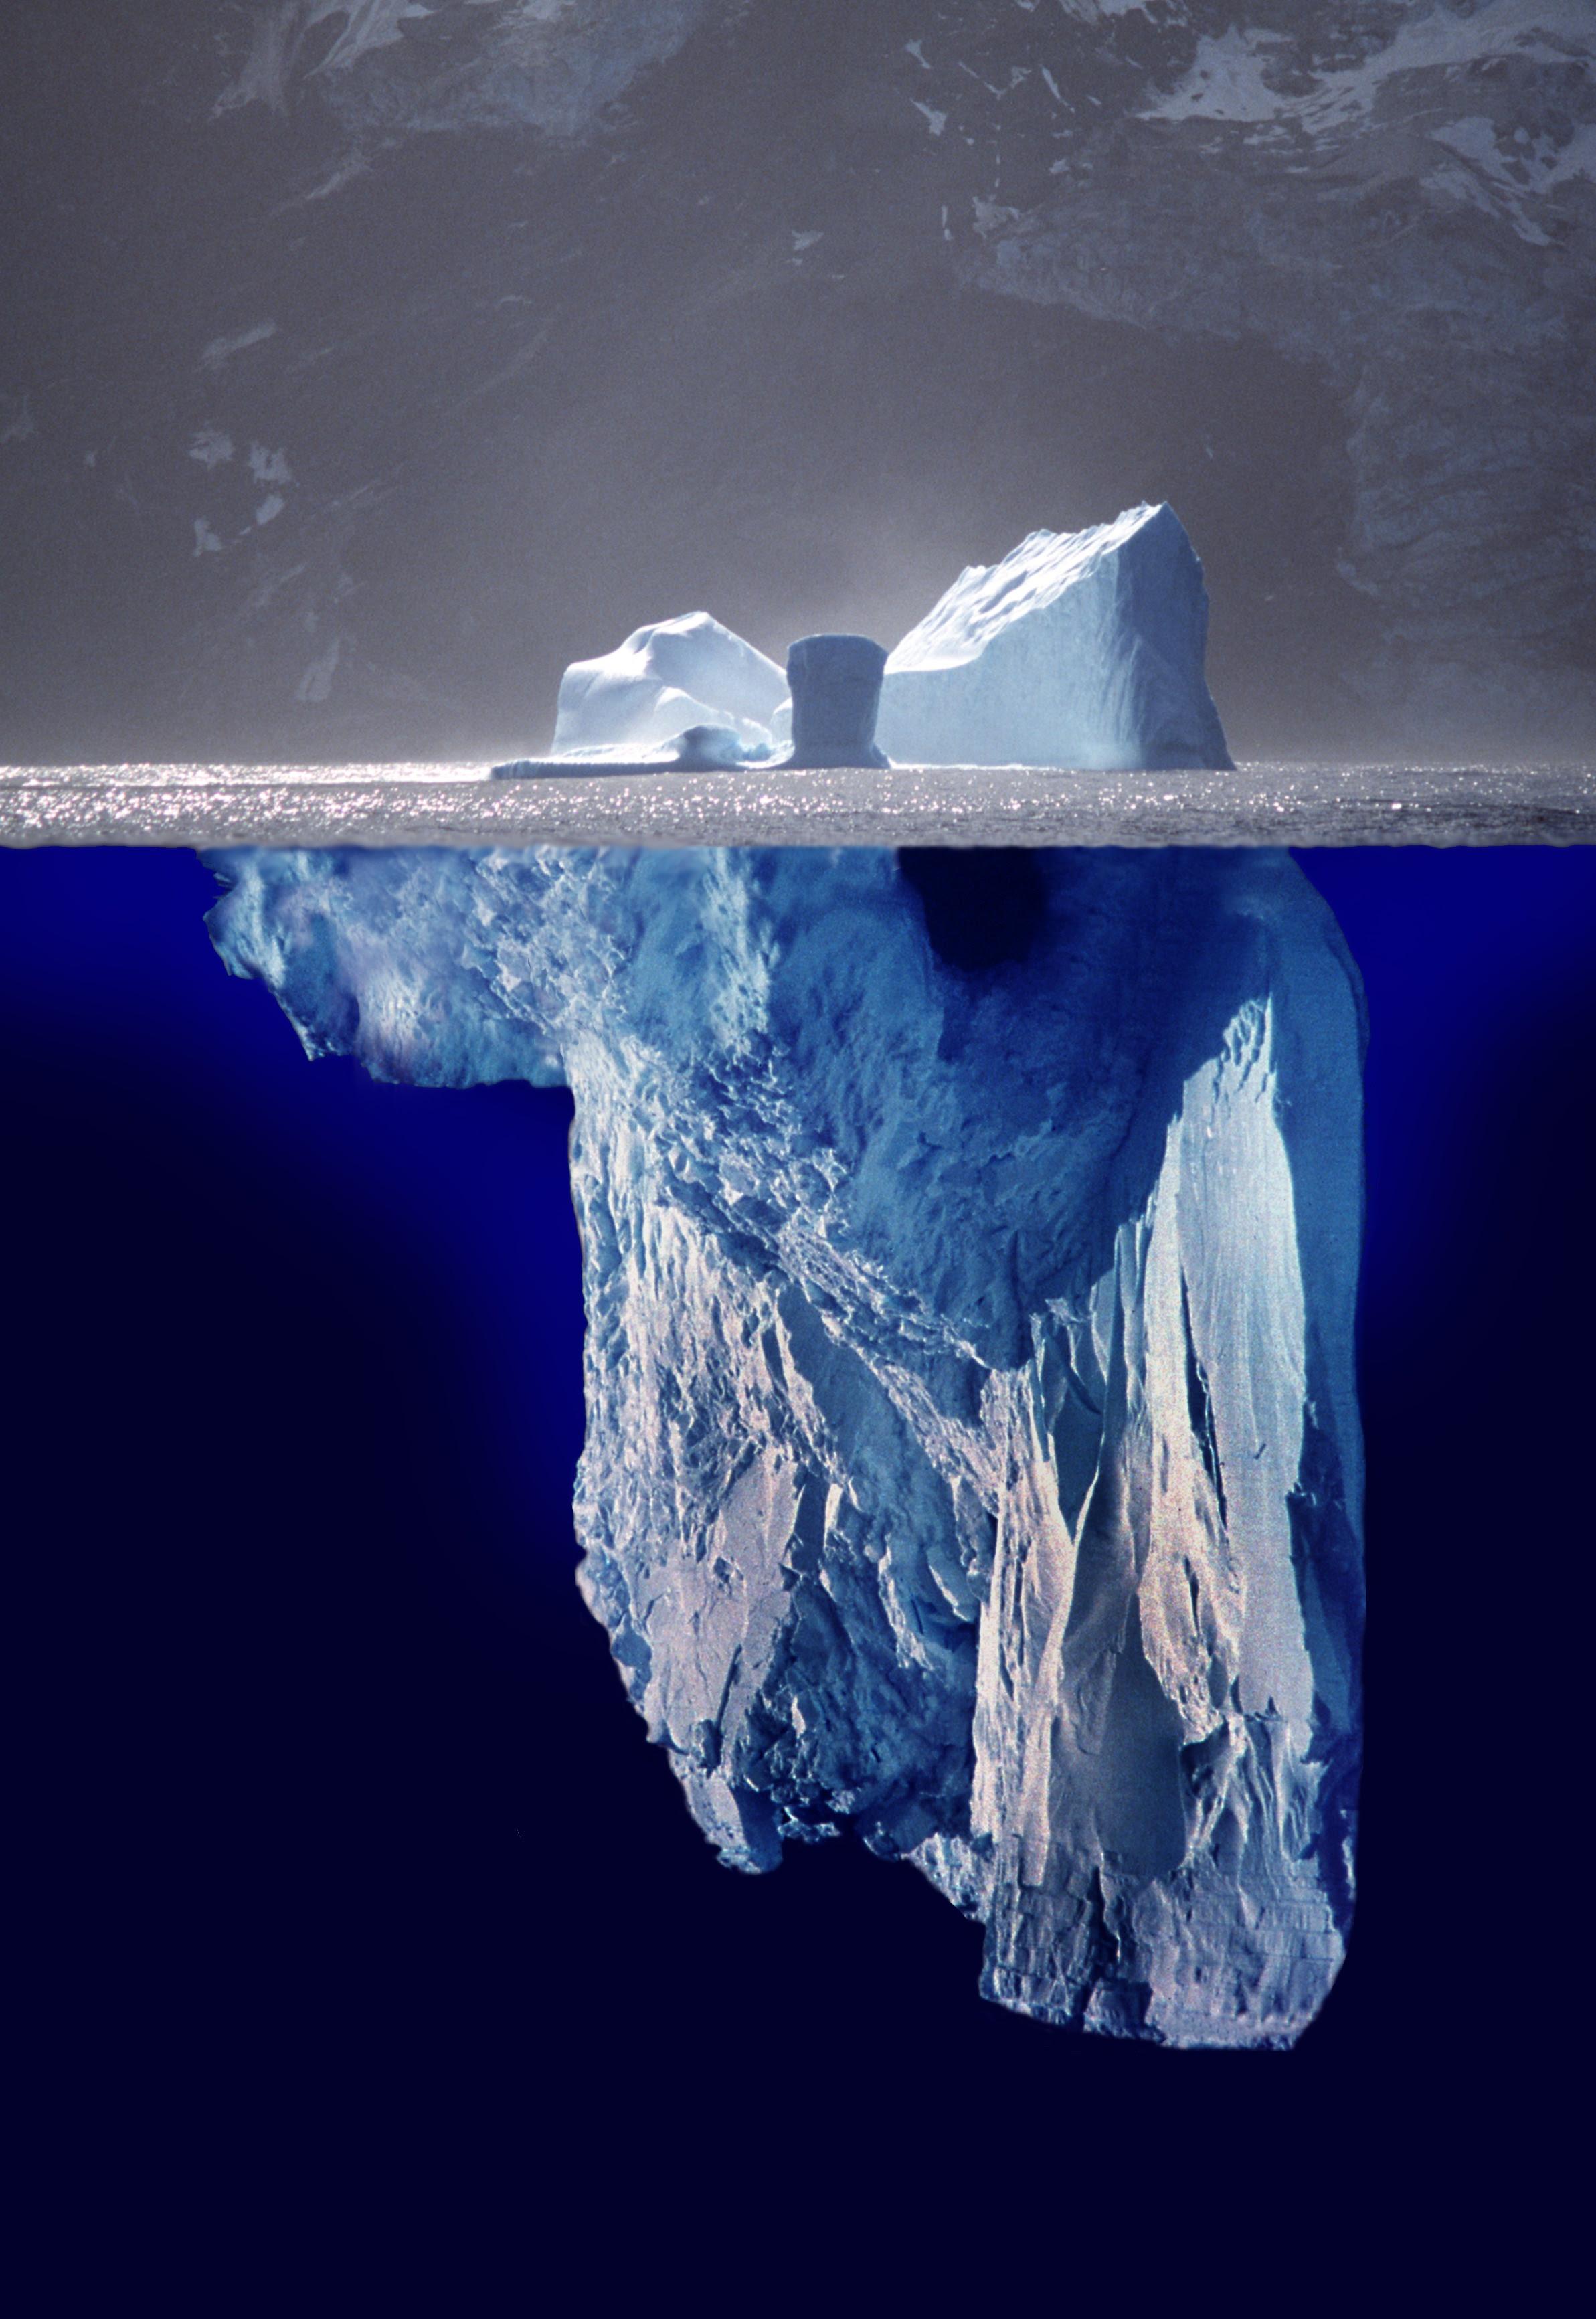 File:Iceberg.jpg